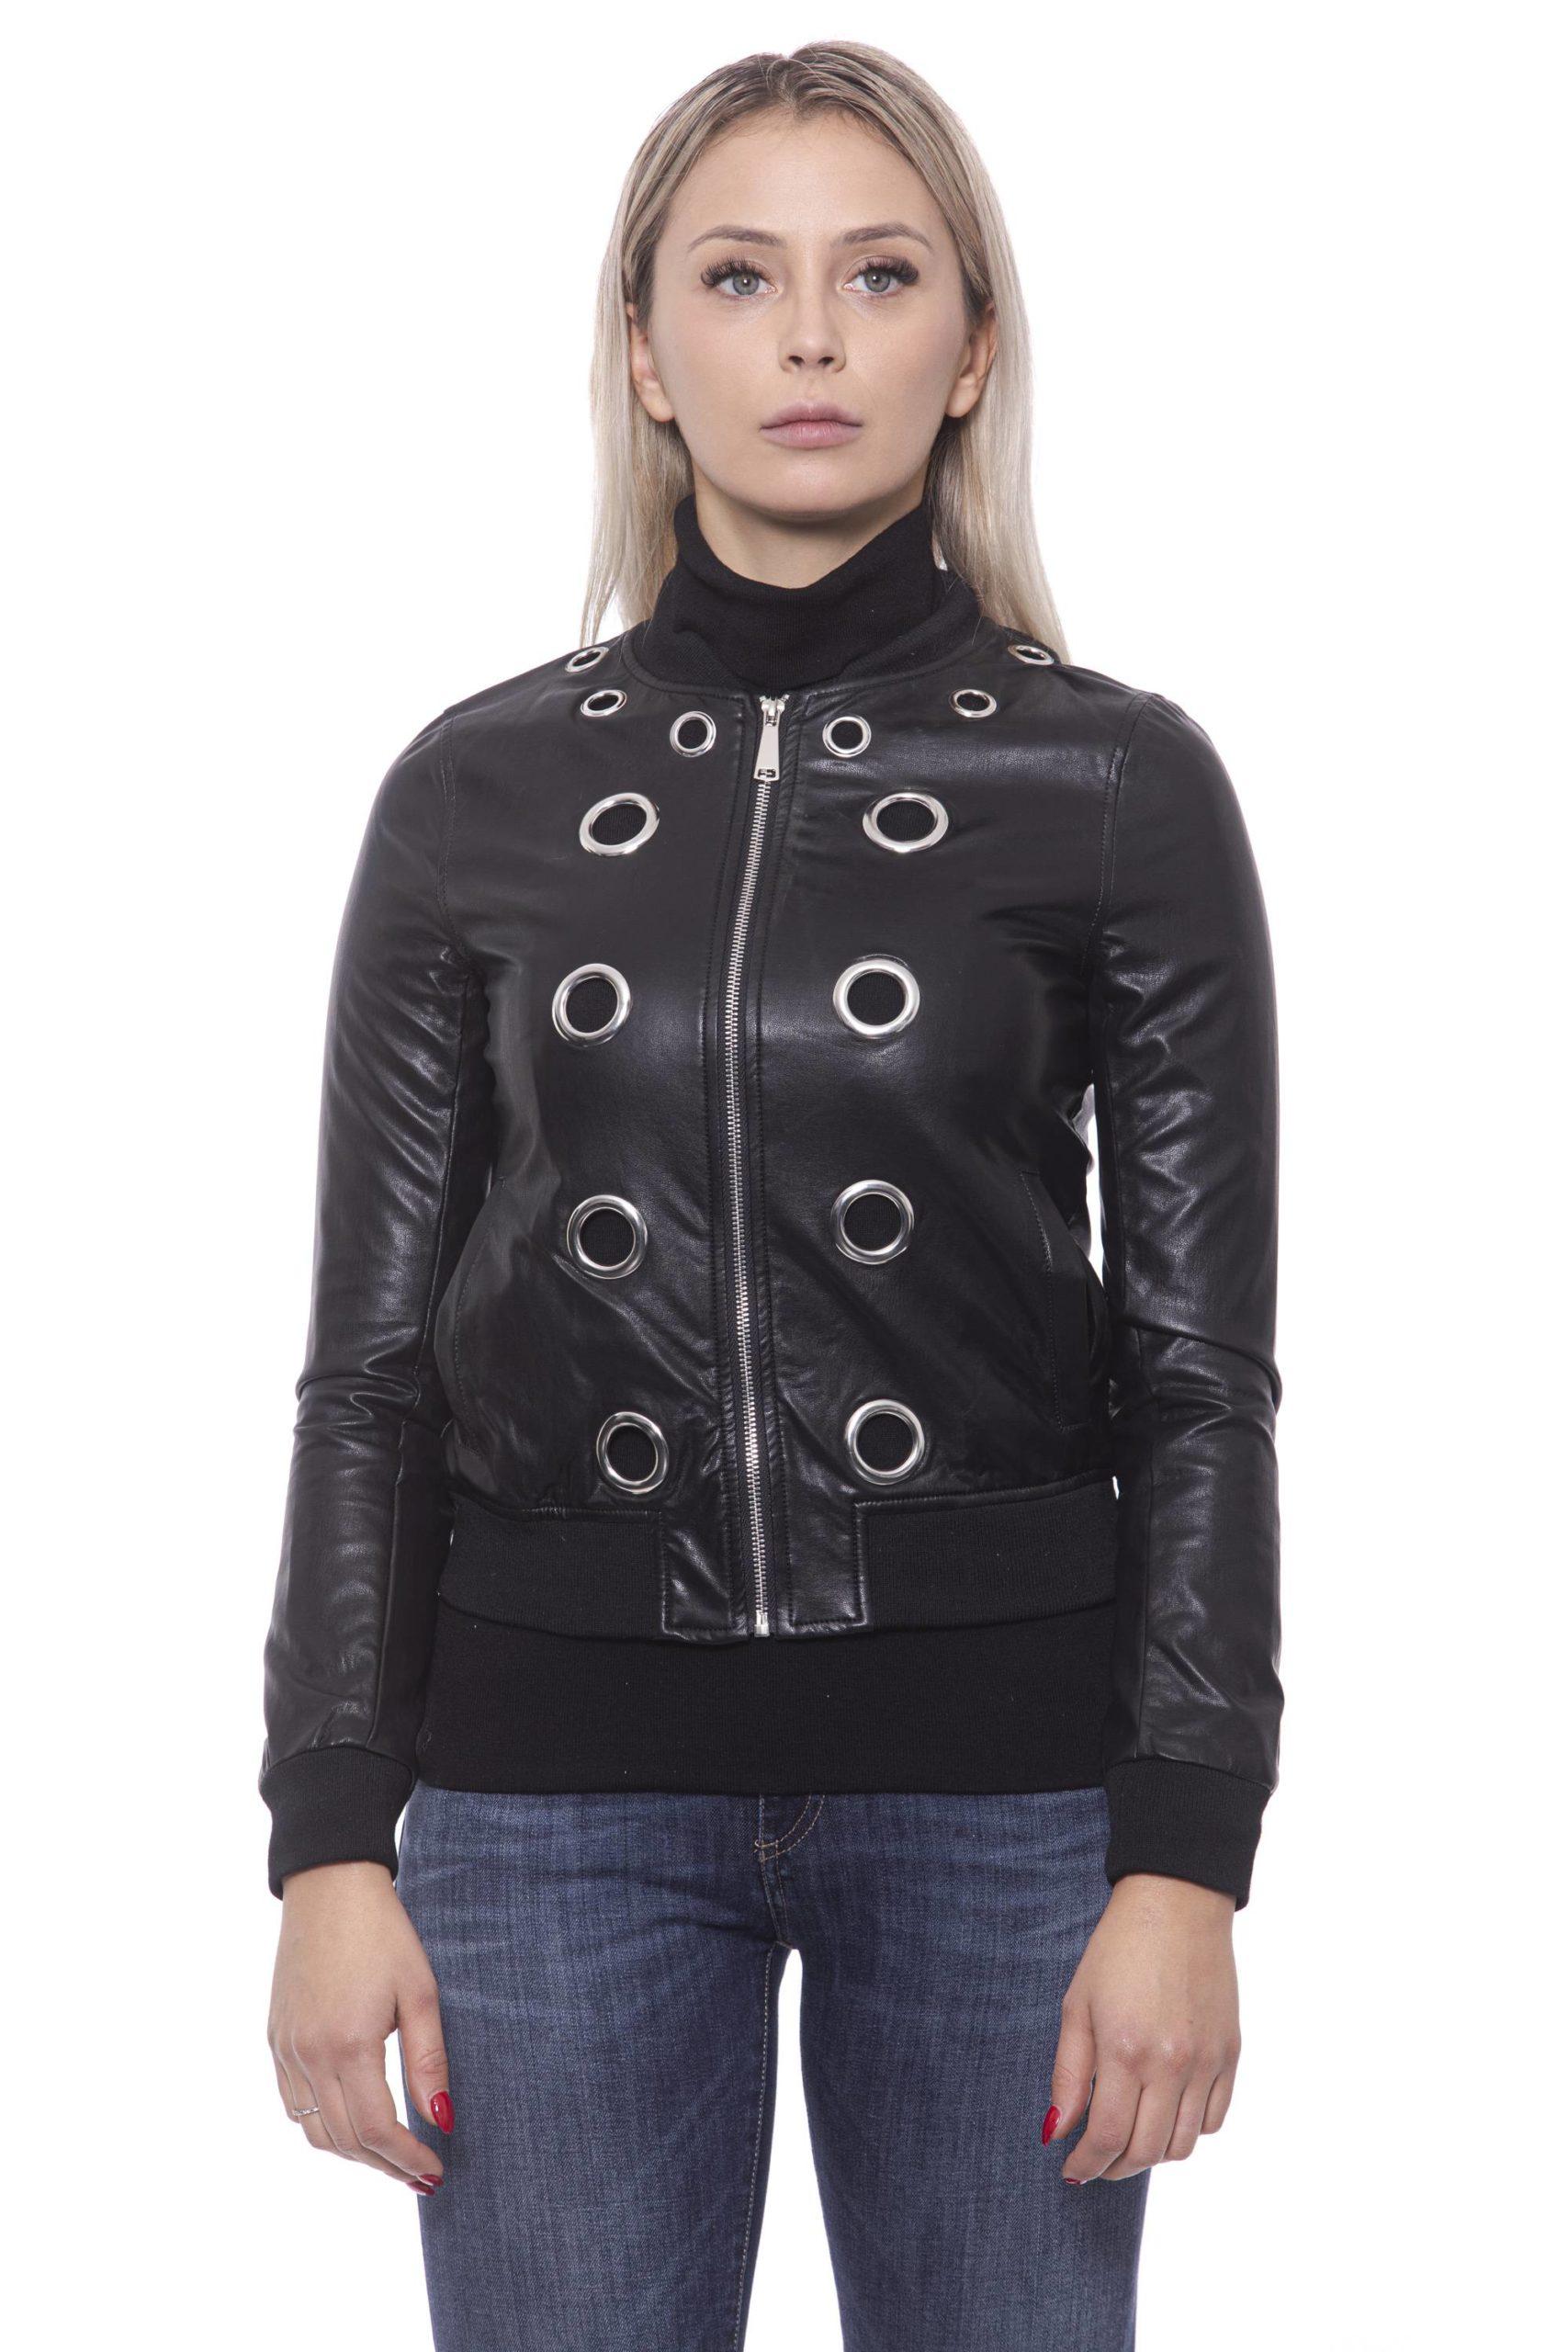 19V69 Italia Women's Nero Jacket 191388248 - IT42 | S